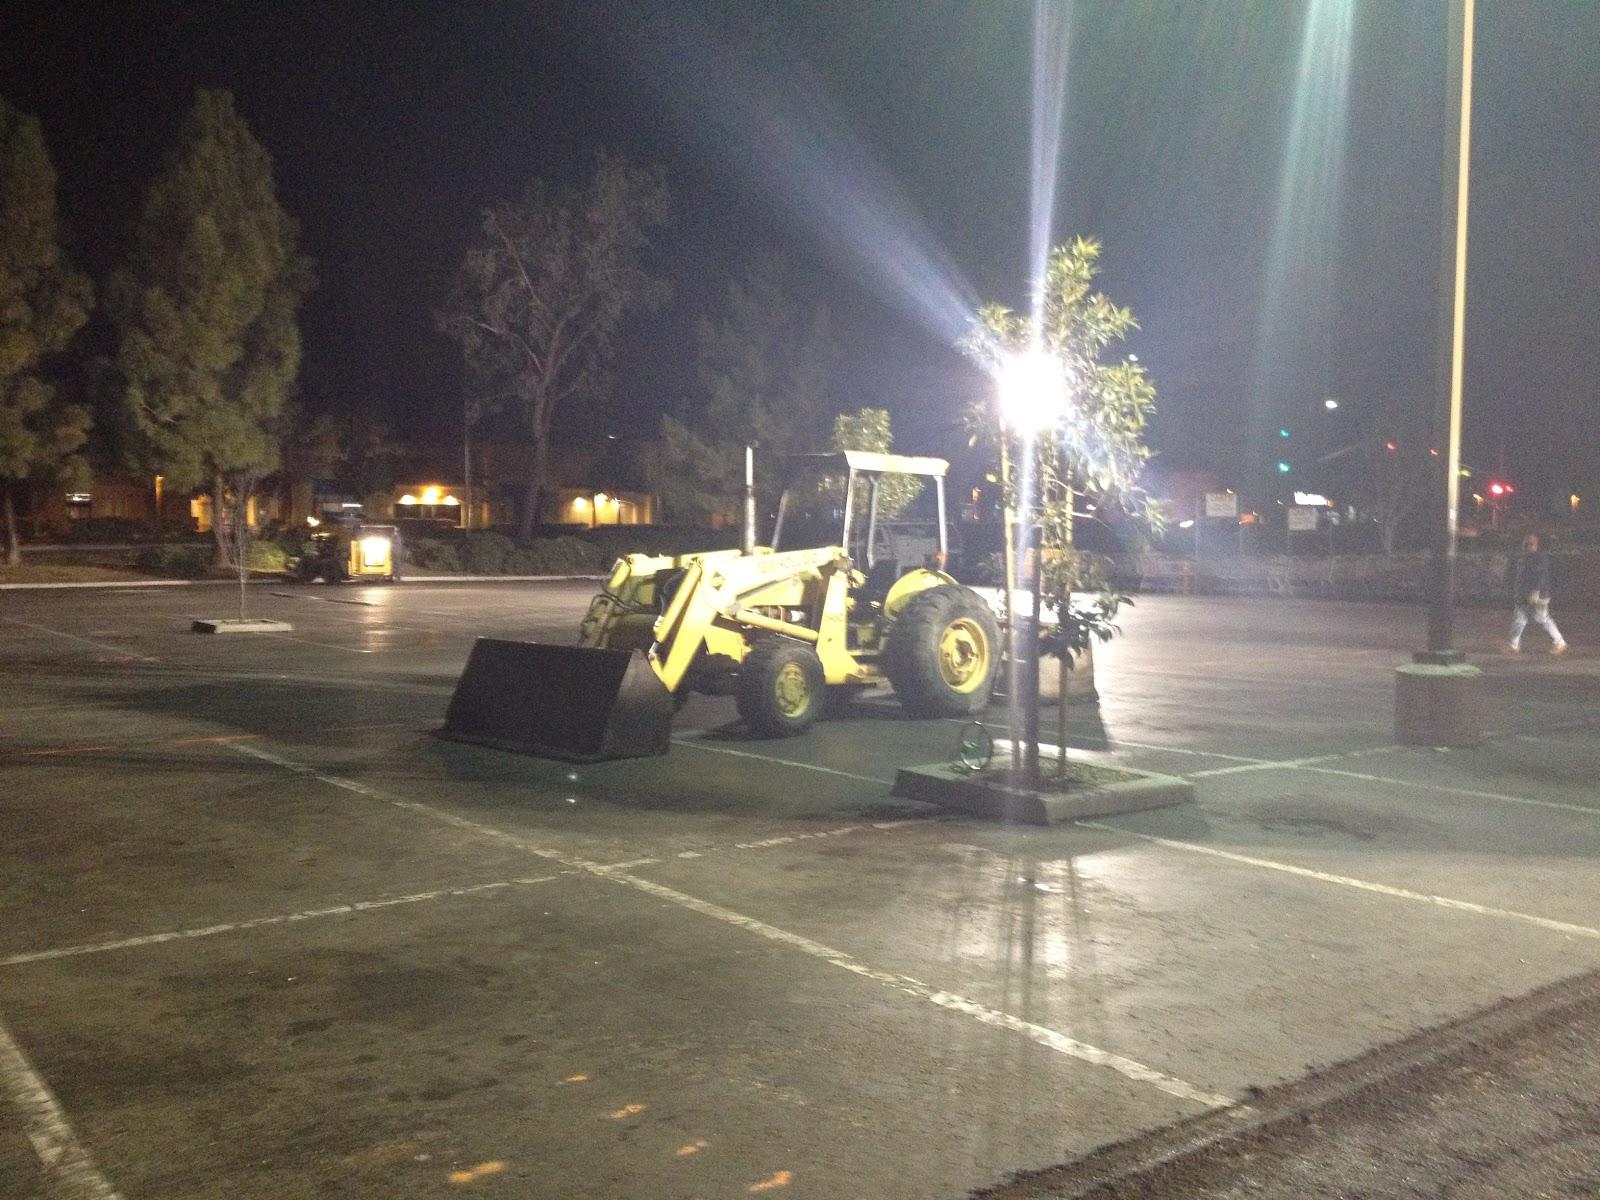 international paving services paving costco santee ca tuesday 14 2012